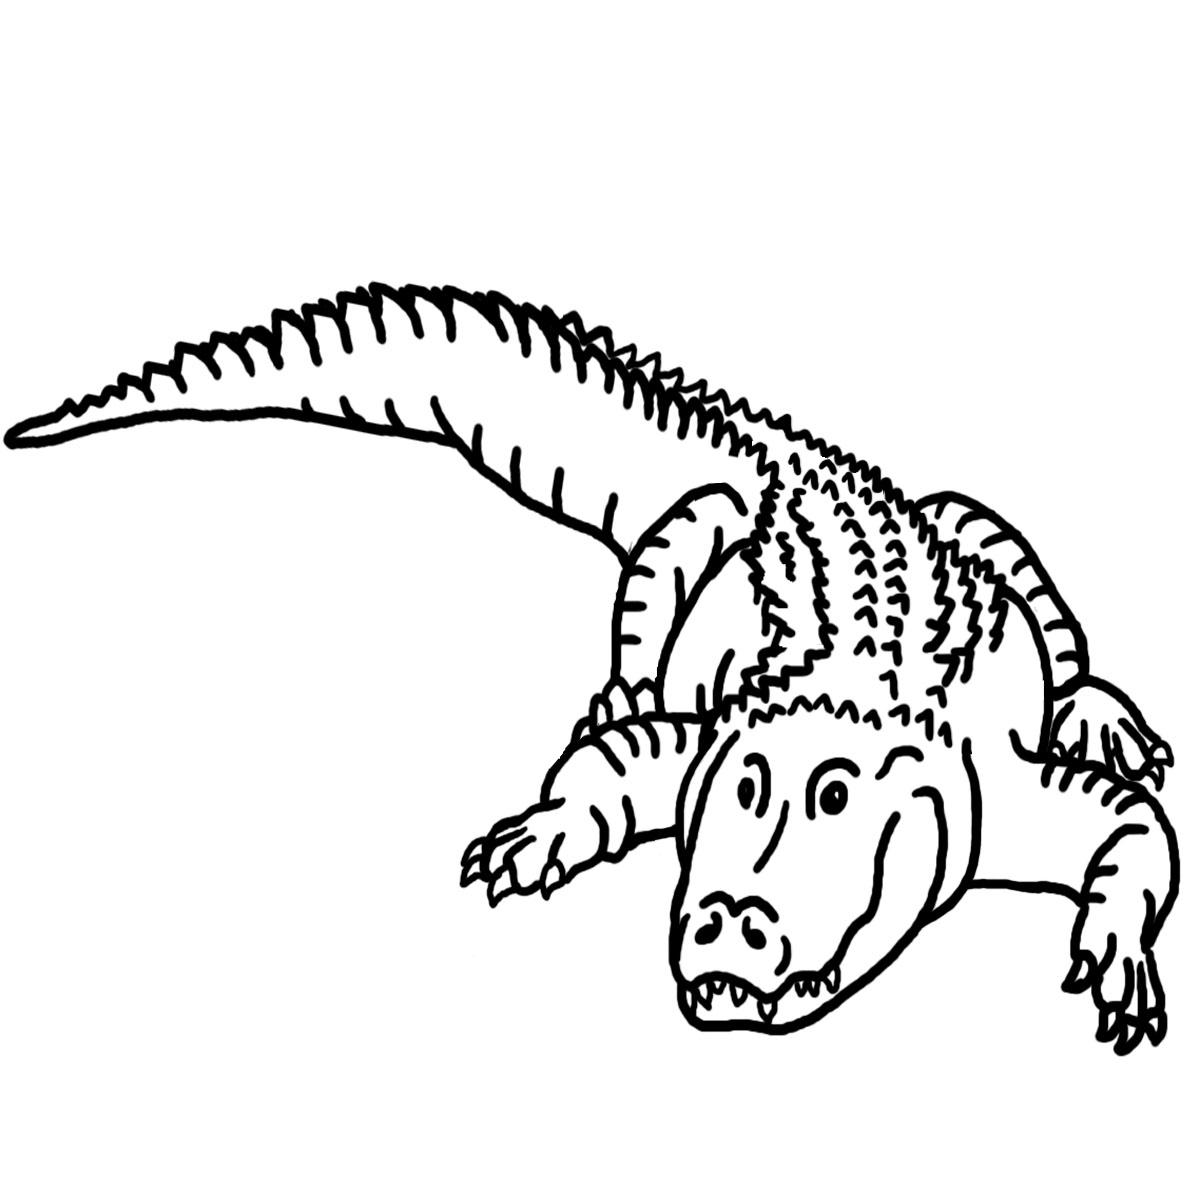 Free Reptile Cliparts, Download Free Clip Art, Free Clip Art.